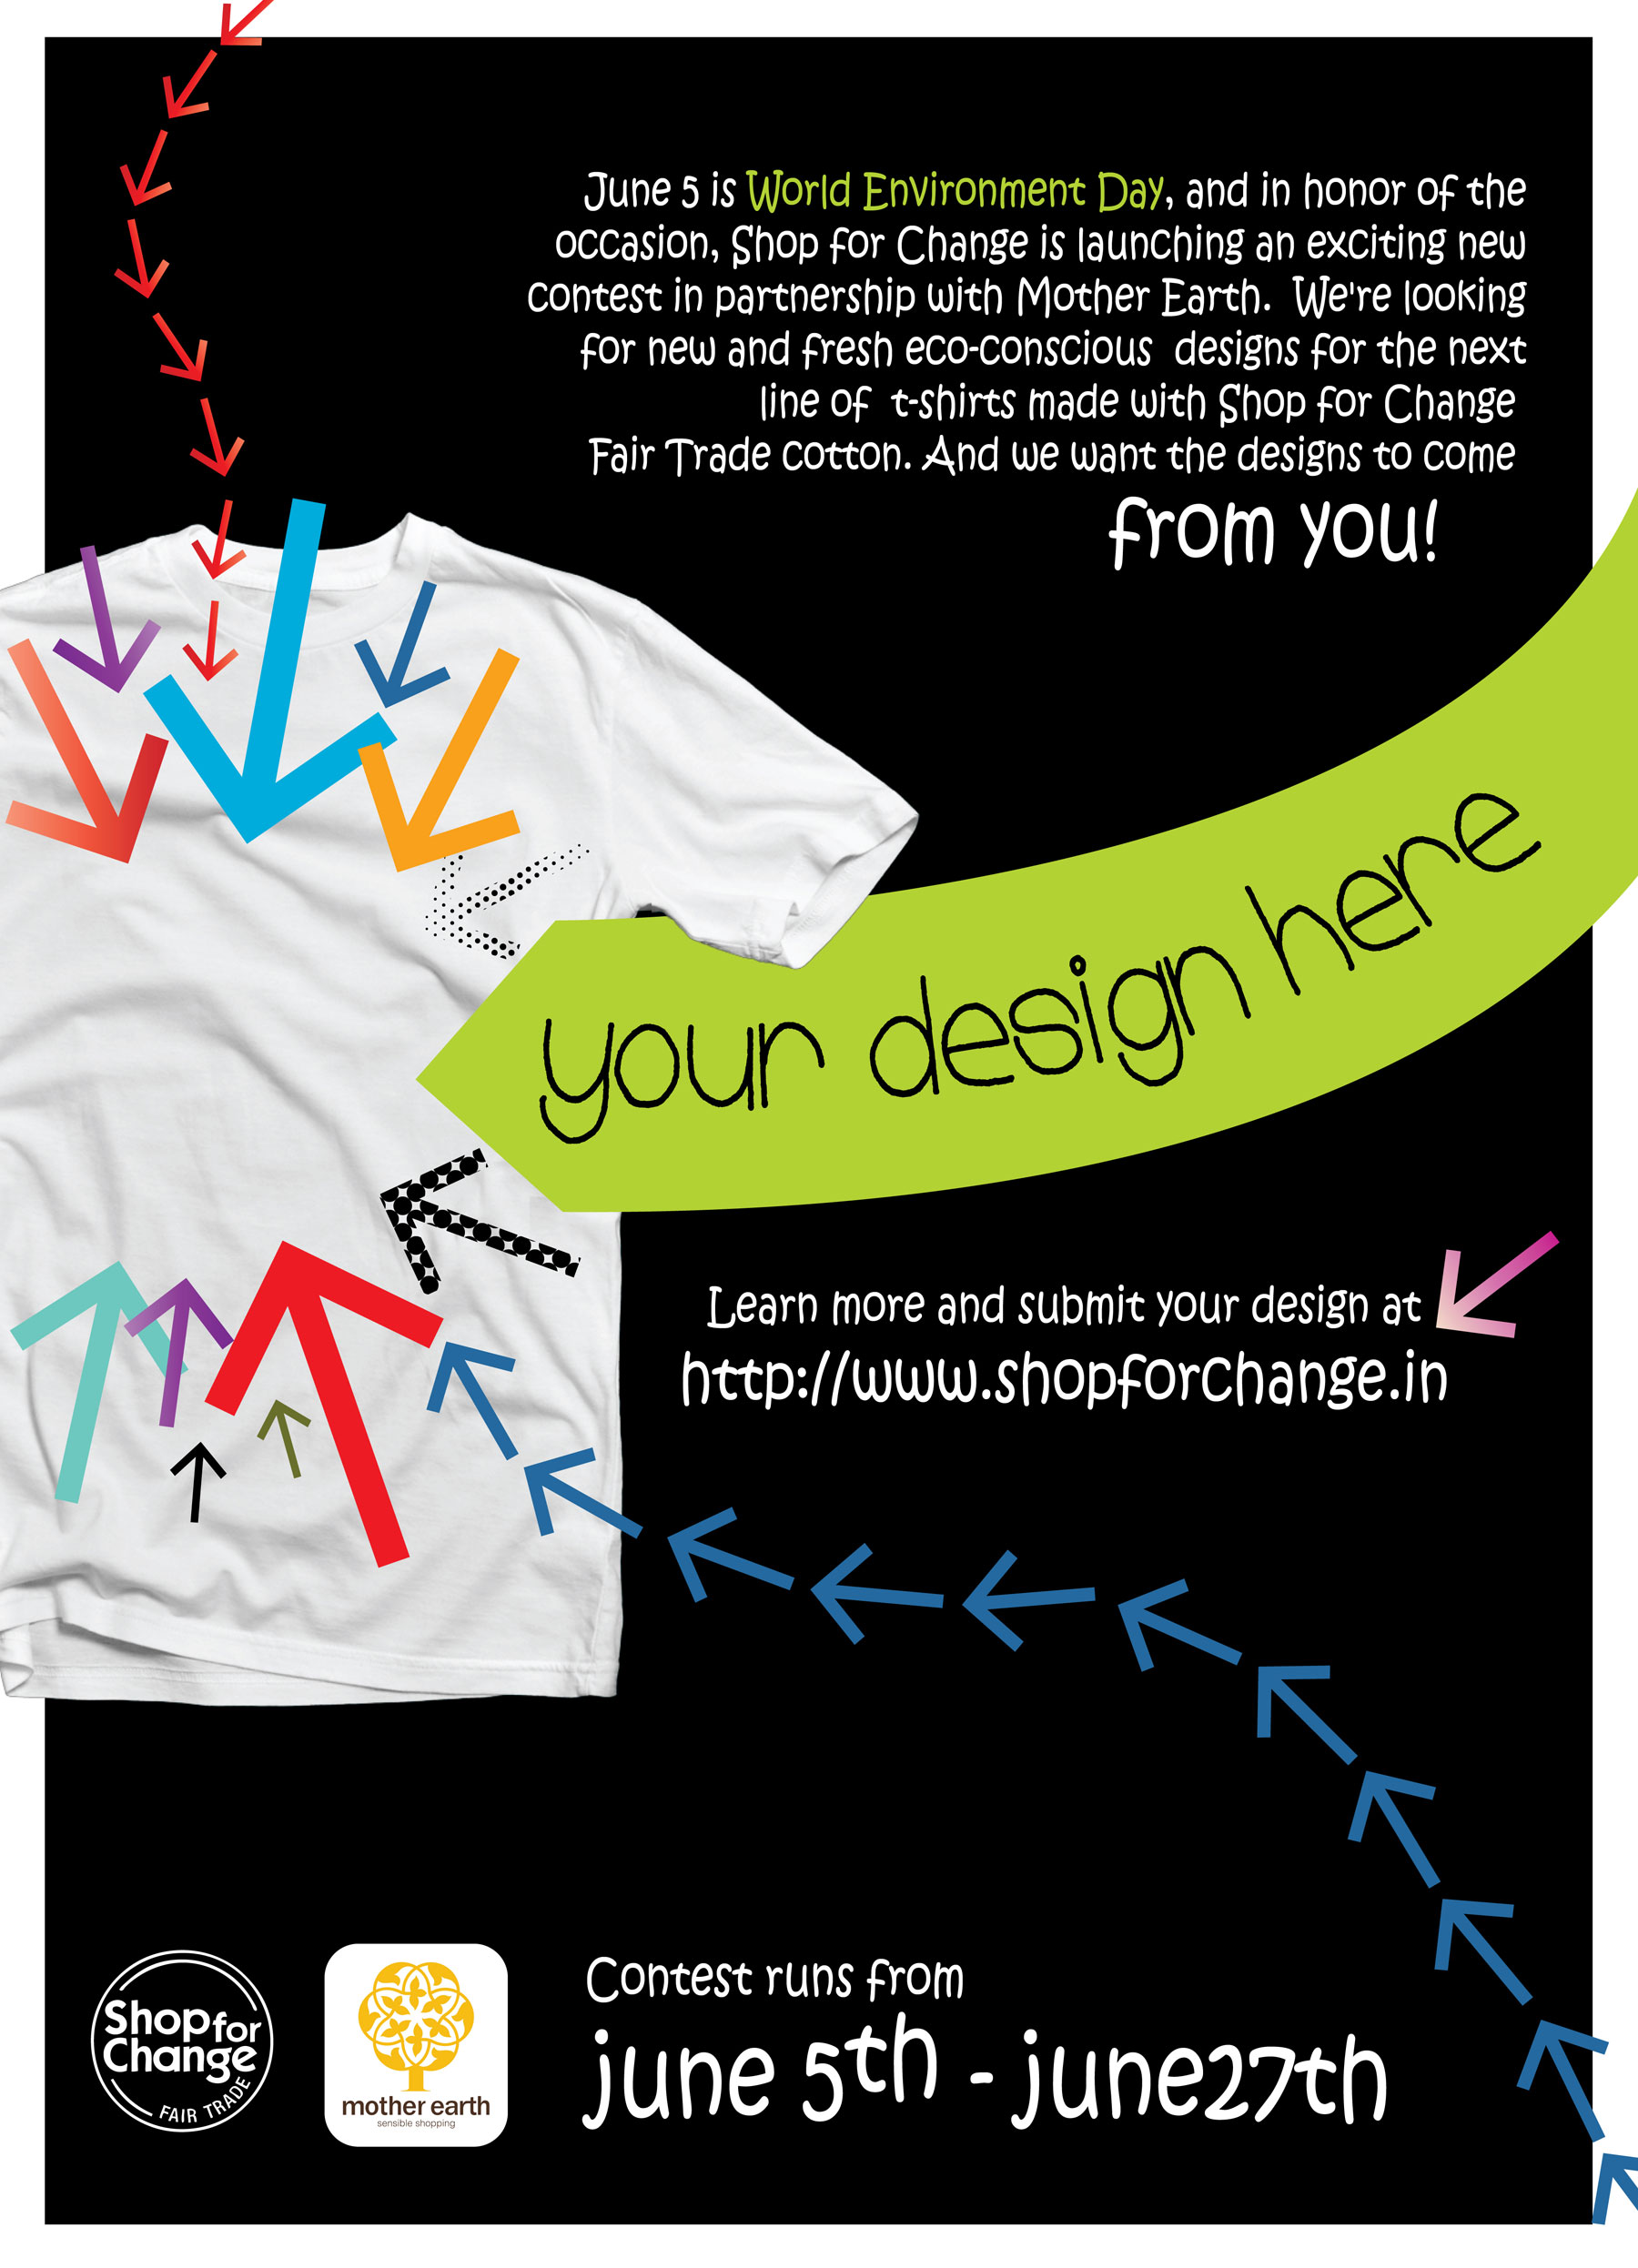 T shirt poster design - T Shirt Poster Design In